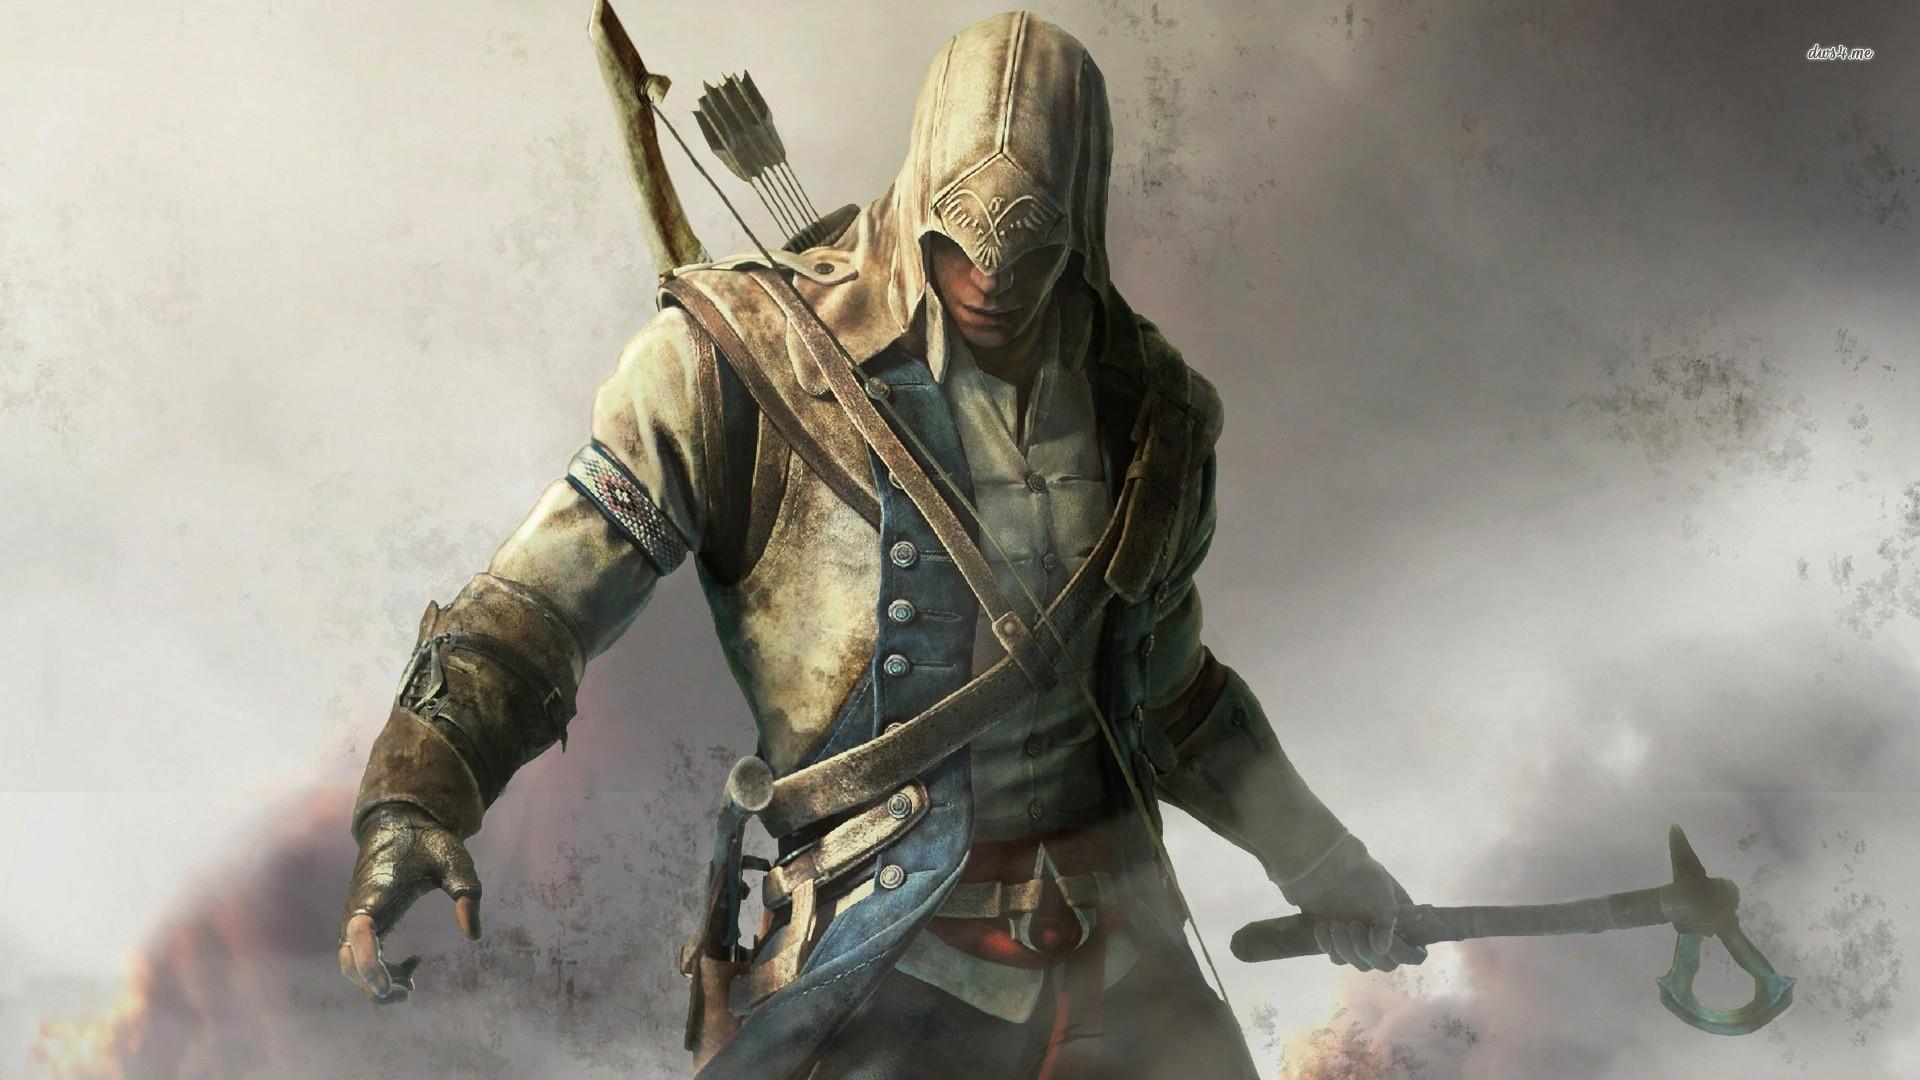 Assassins creed 3 wallpaper 1920x1080 wallpapersafari games assassins creed assassins creed iii voltagebd Gallery